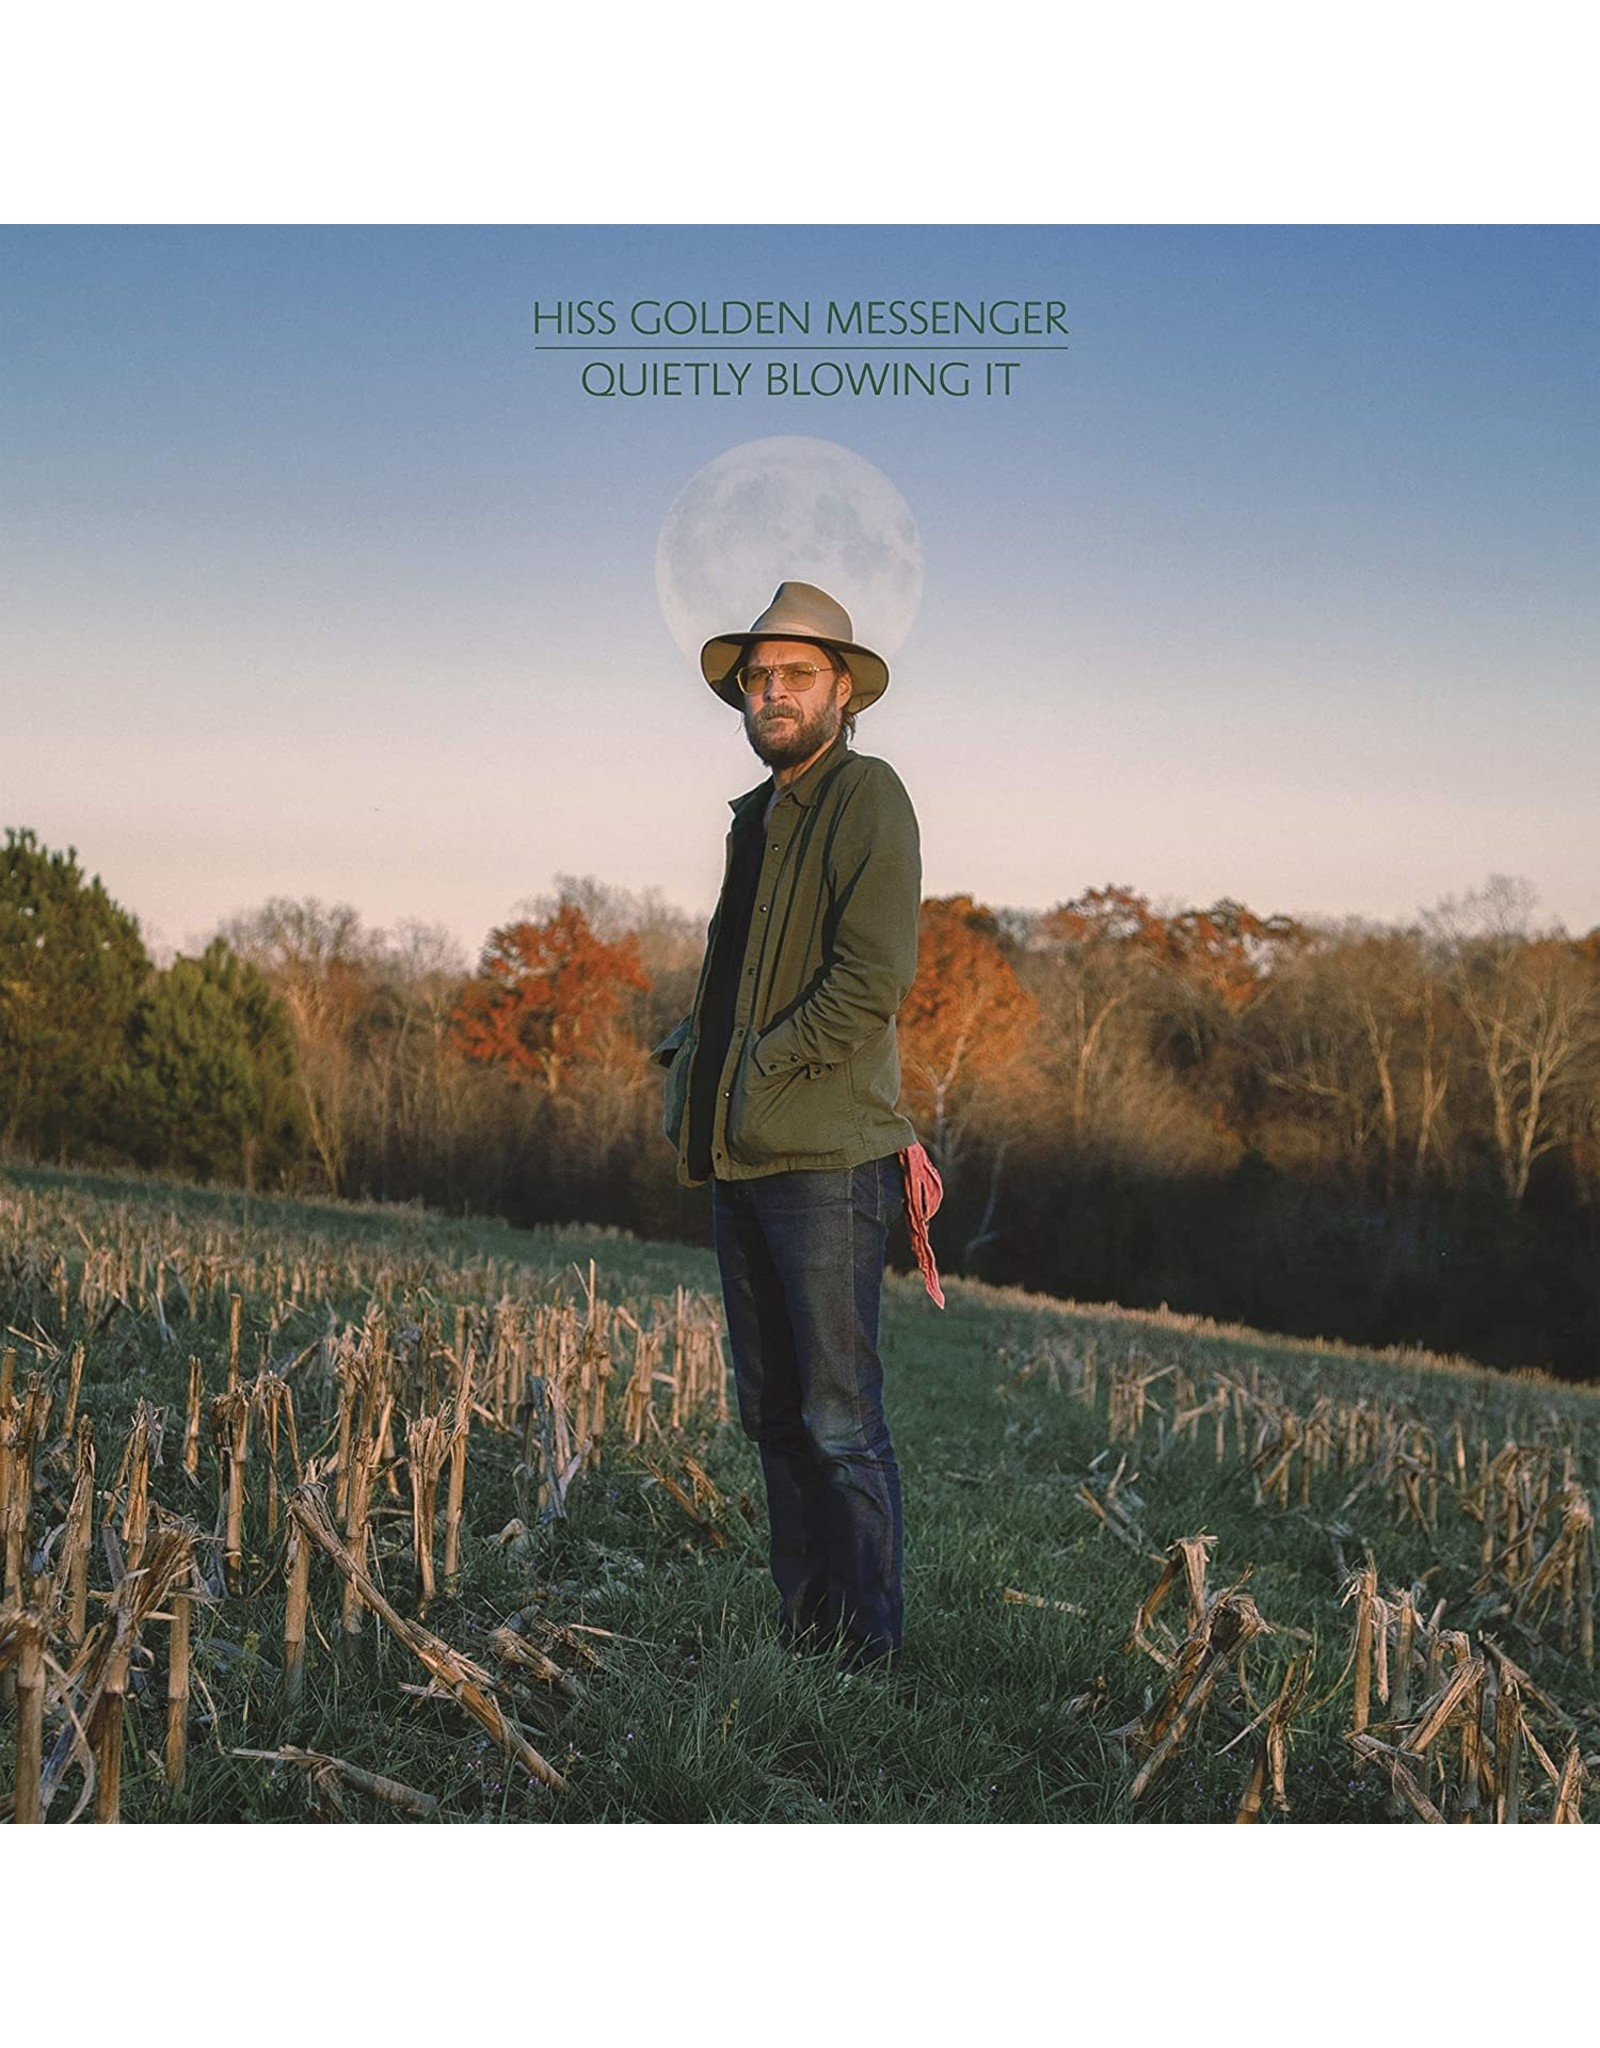 Hiss Golden Messenger - Quietly Blowing It (Exclusive Blue Vinyl)